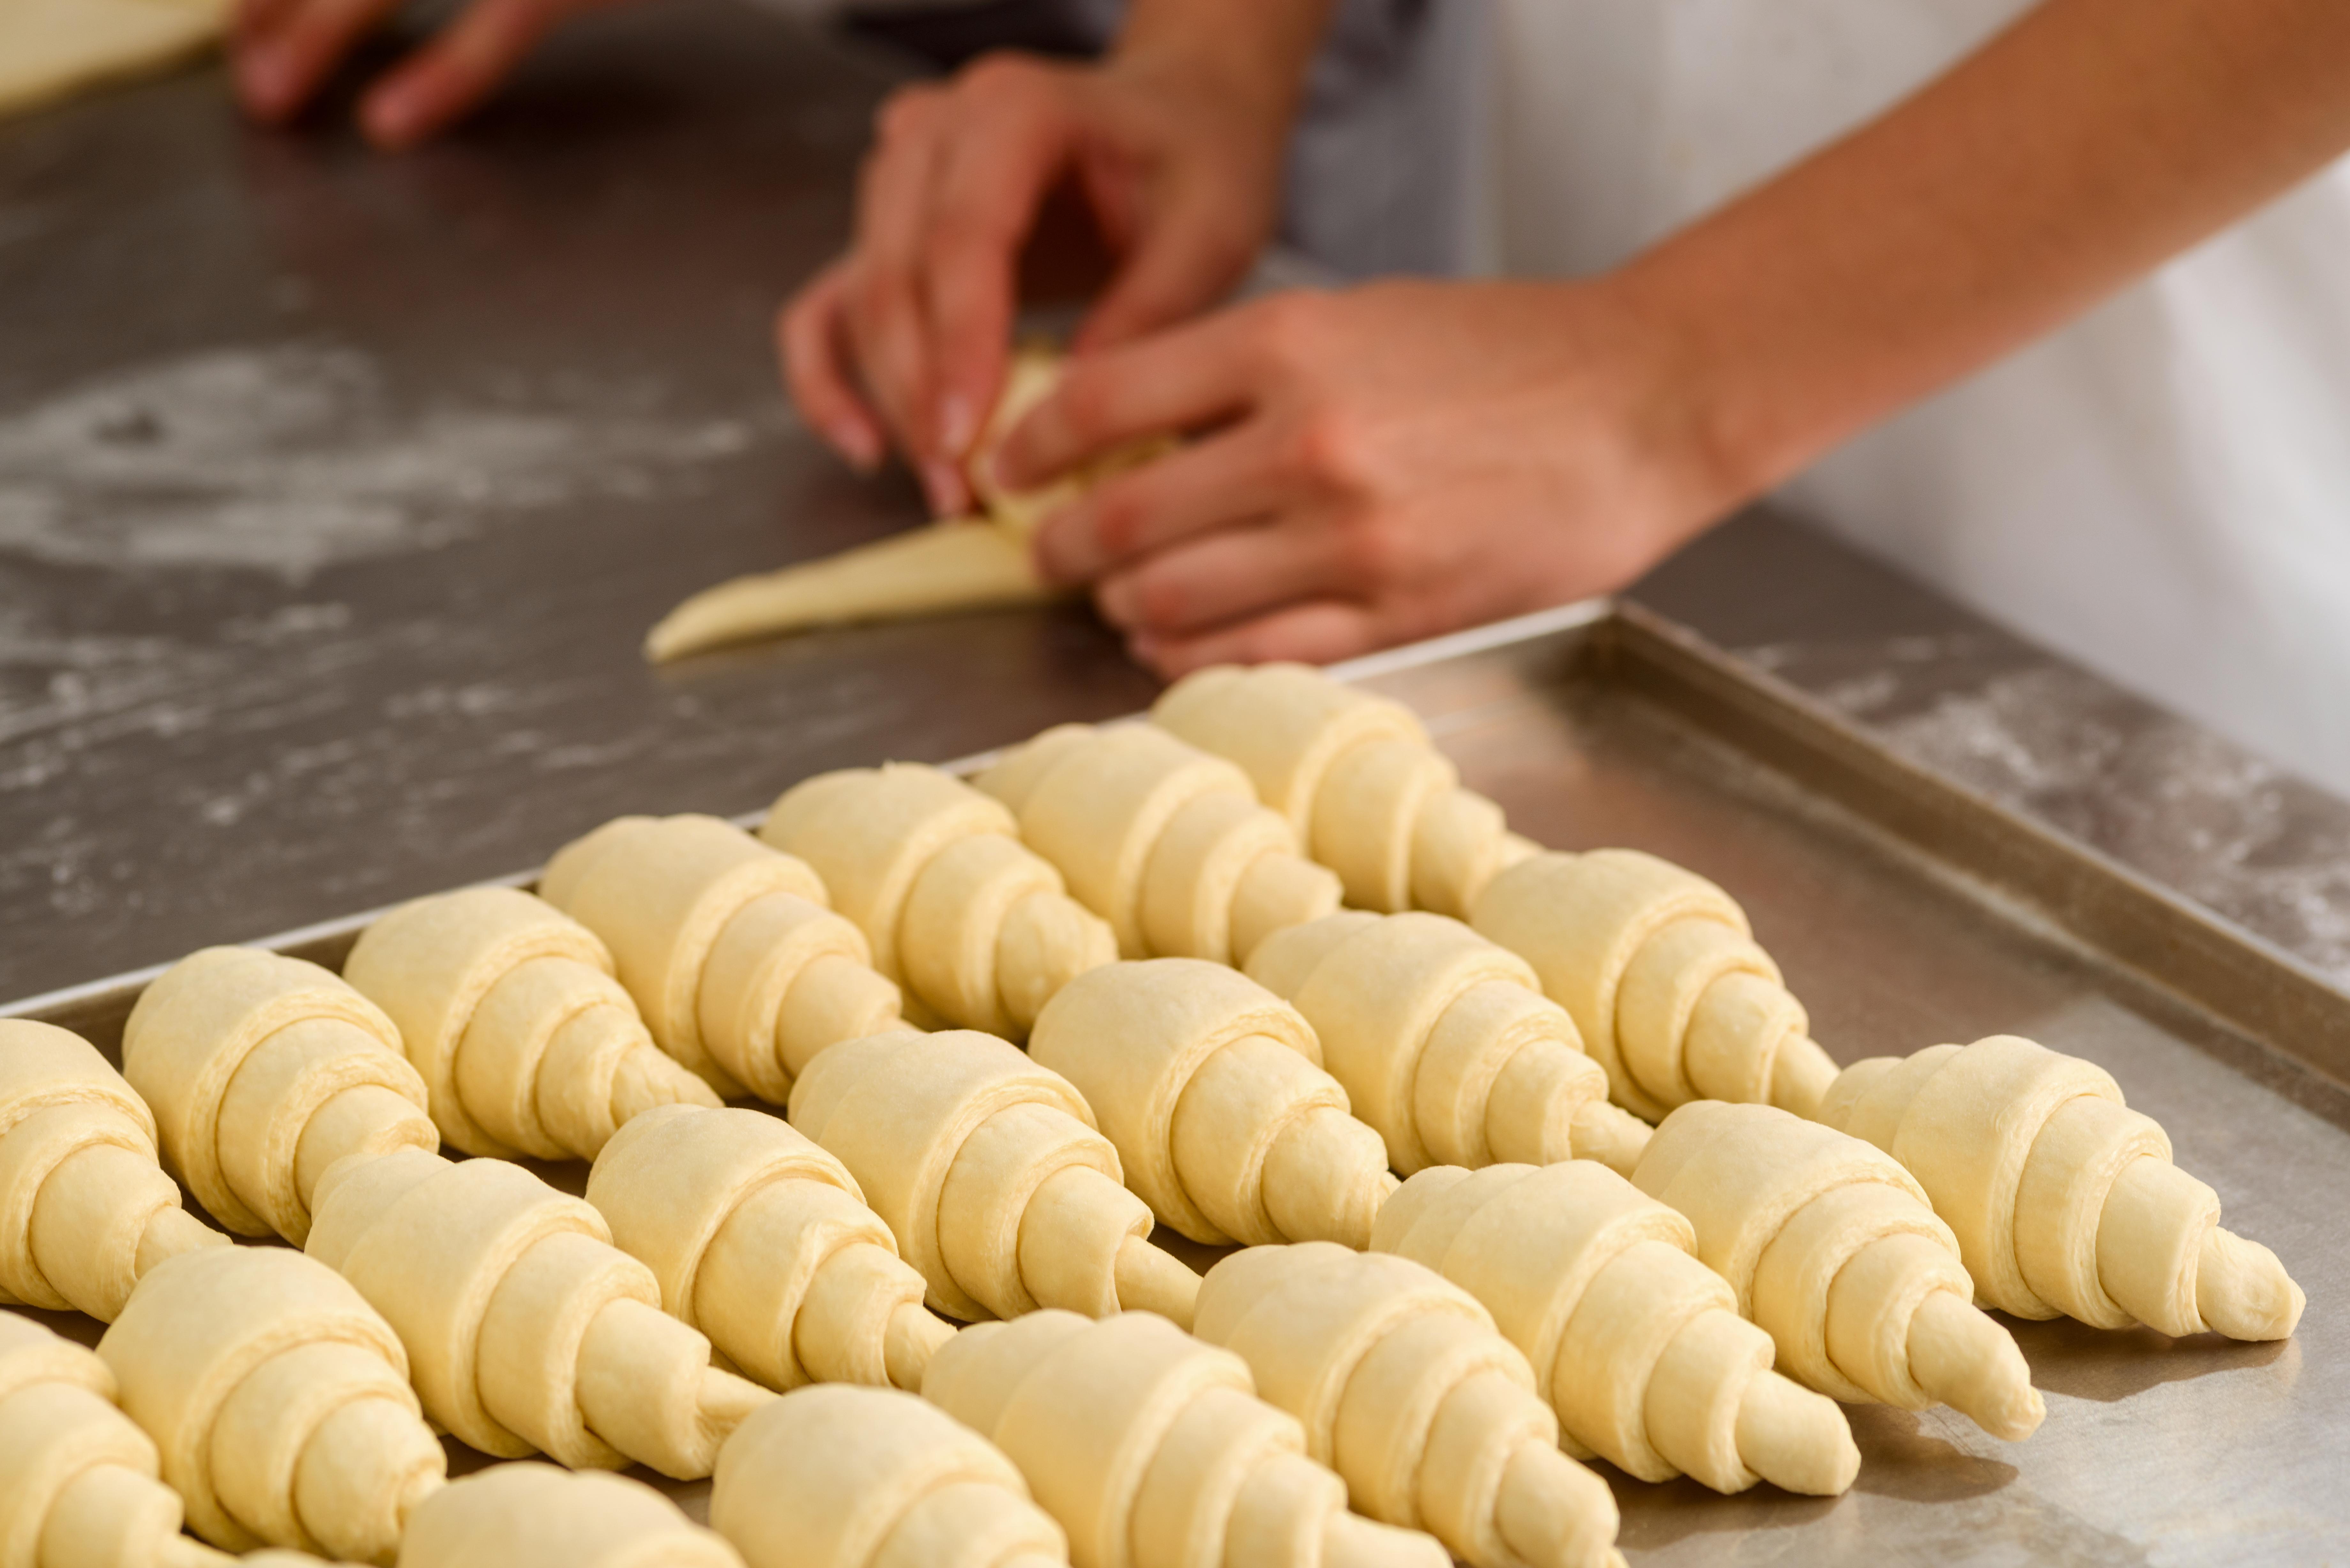 Making Croissants